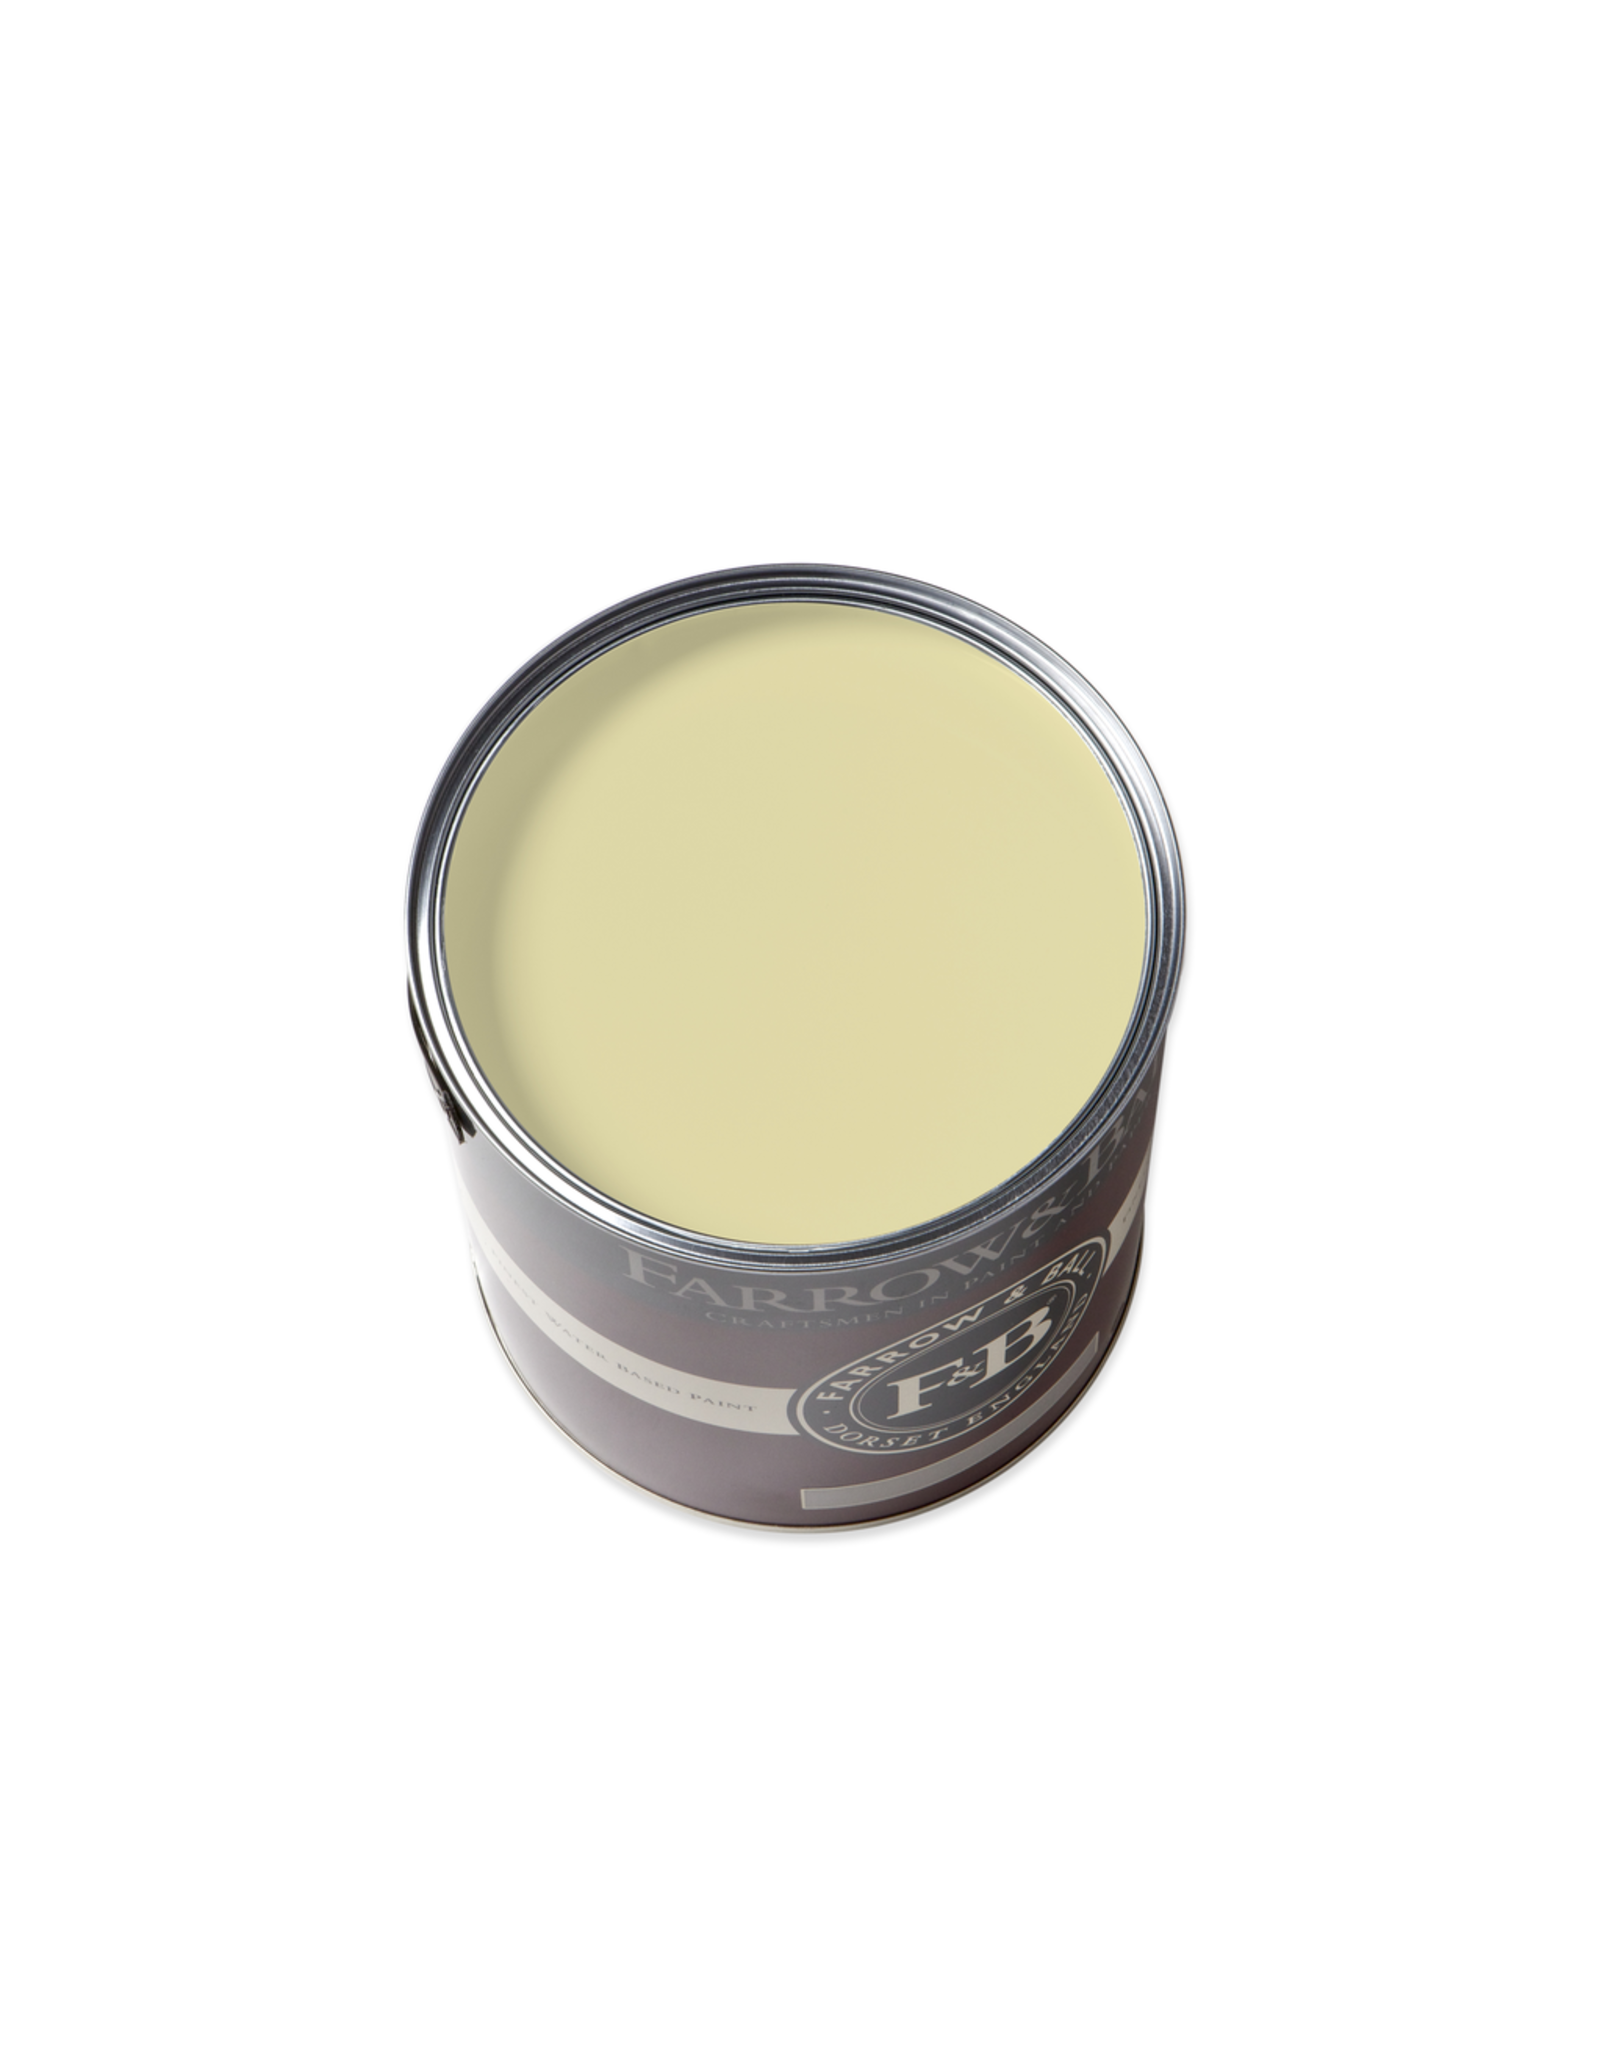 Farrow and Ball Gallon Modern Emulsion Pale Hound No 71